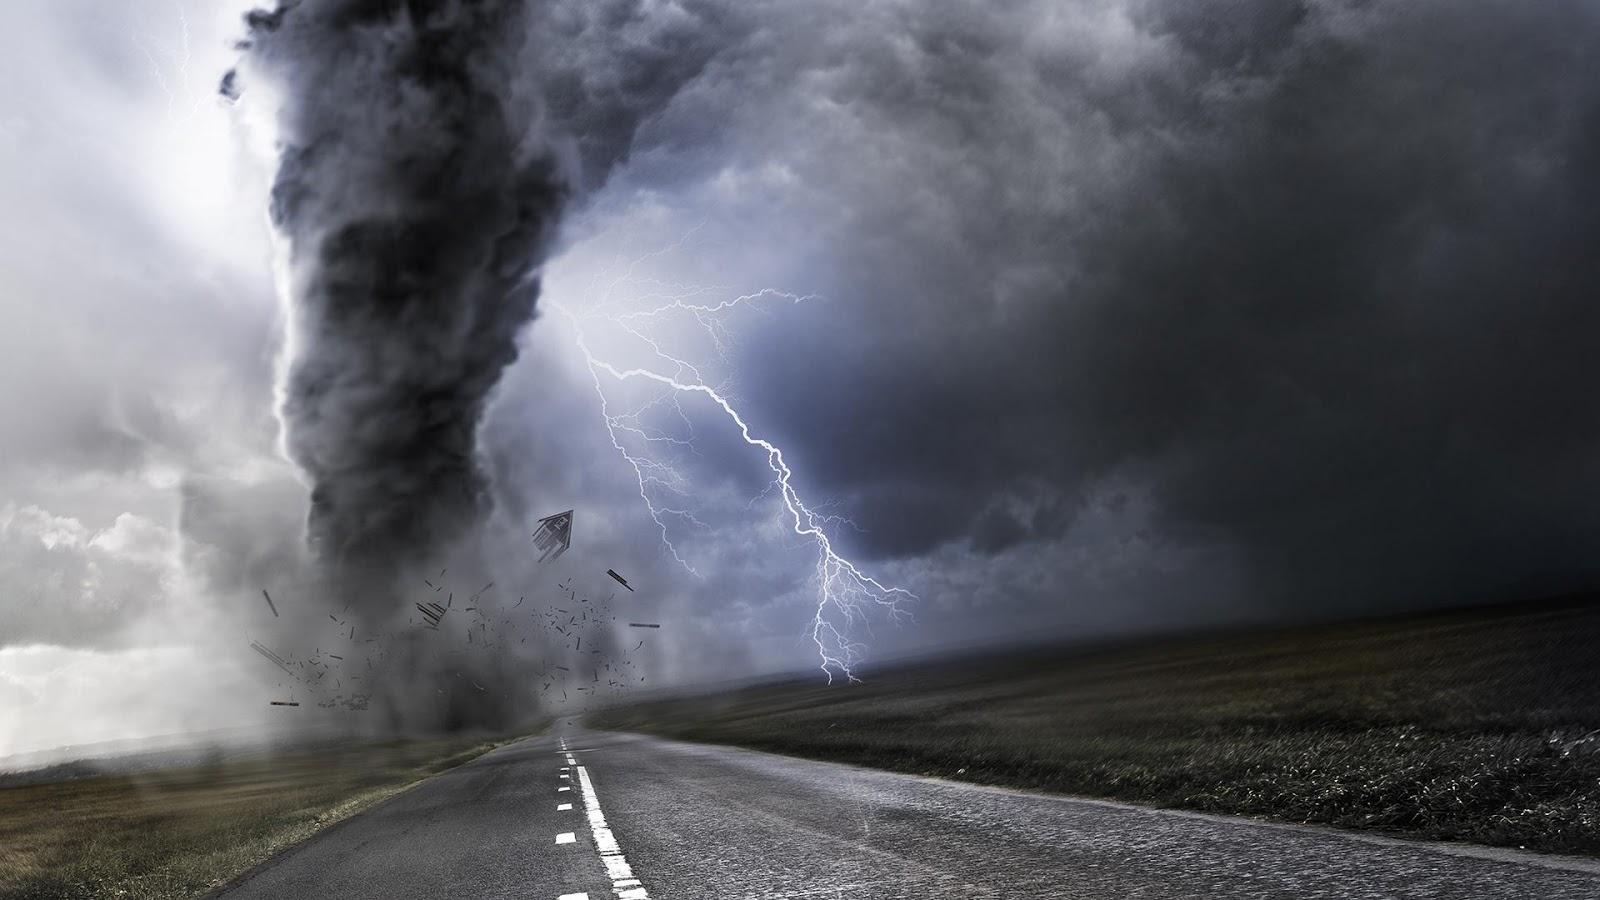 49] Live Tornado Wallpaper on WallpaperSafari 1600x900